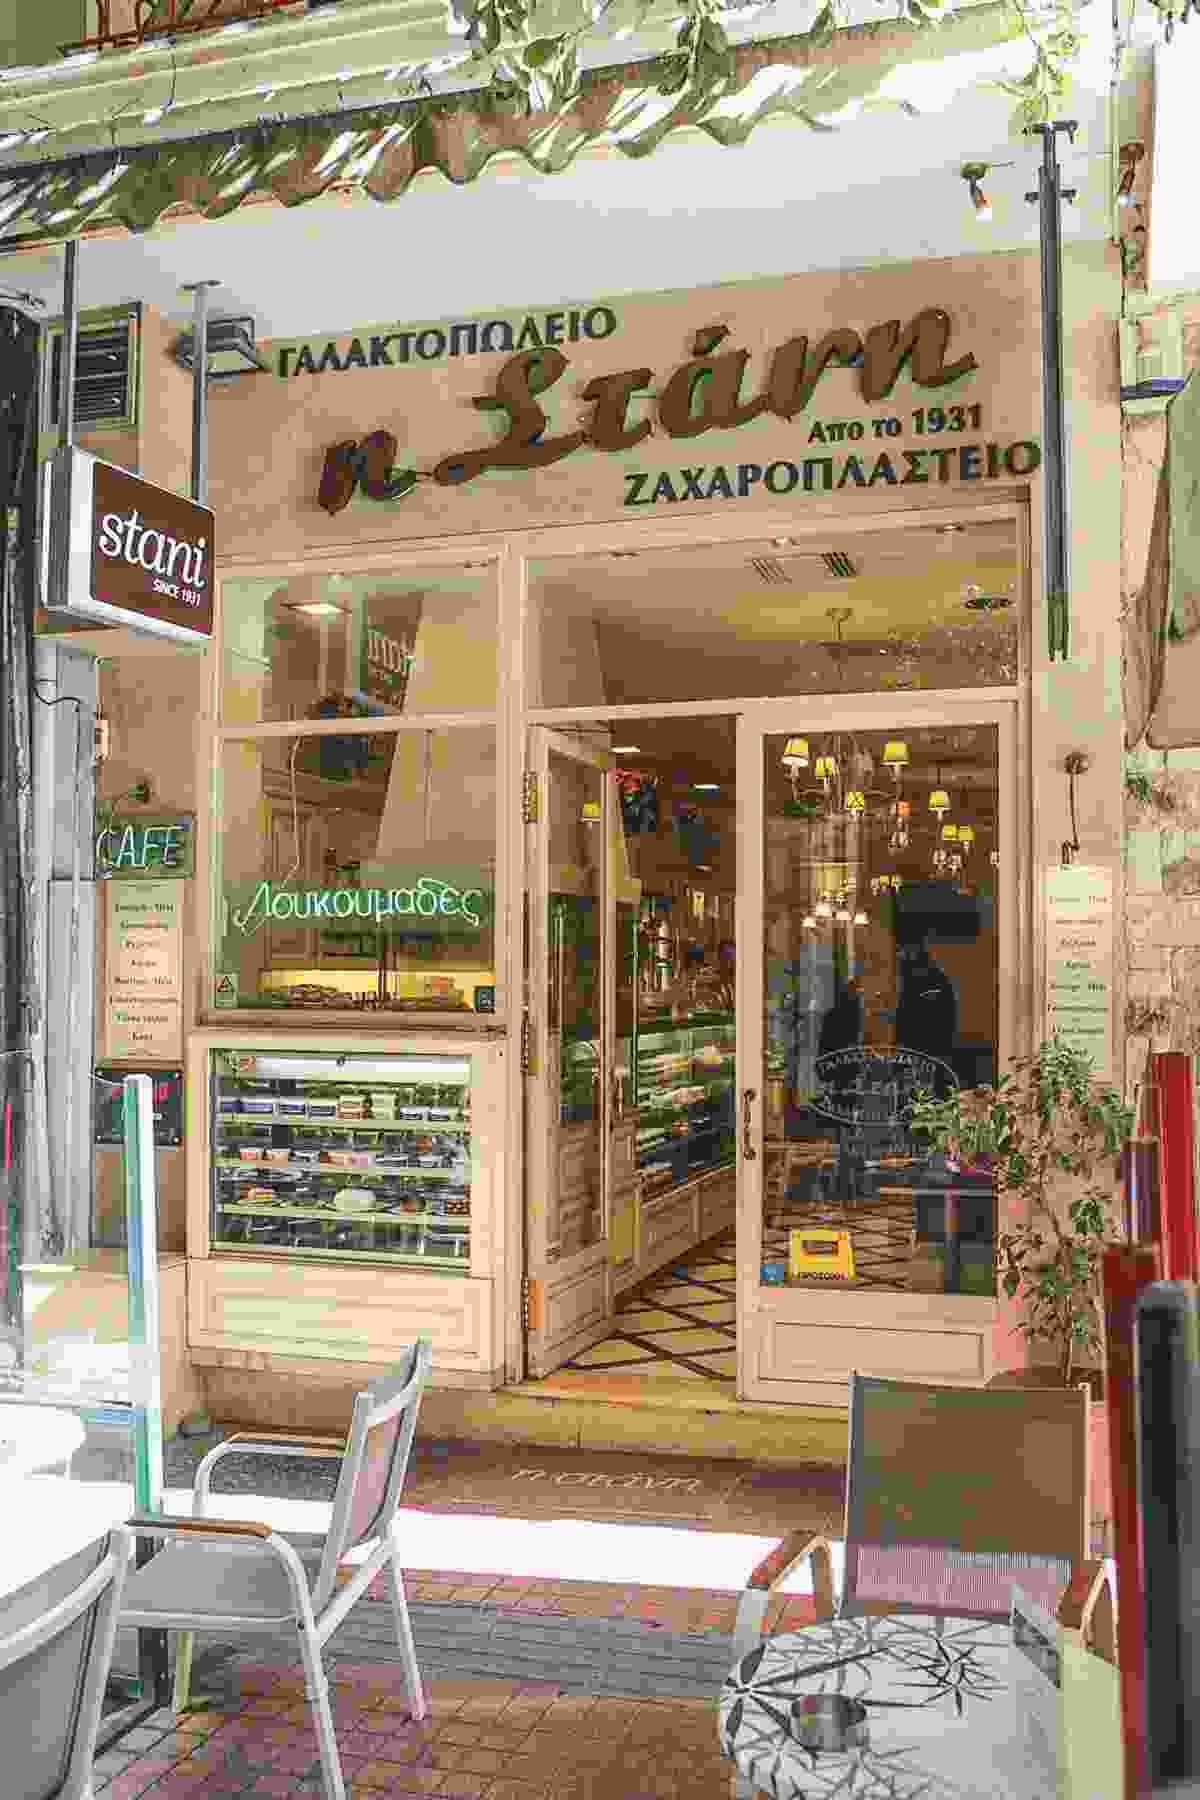 Stani yoghurt cafe (Yannis Varouhakis)